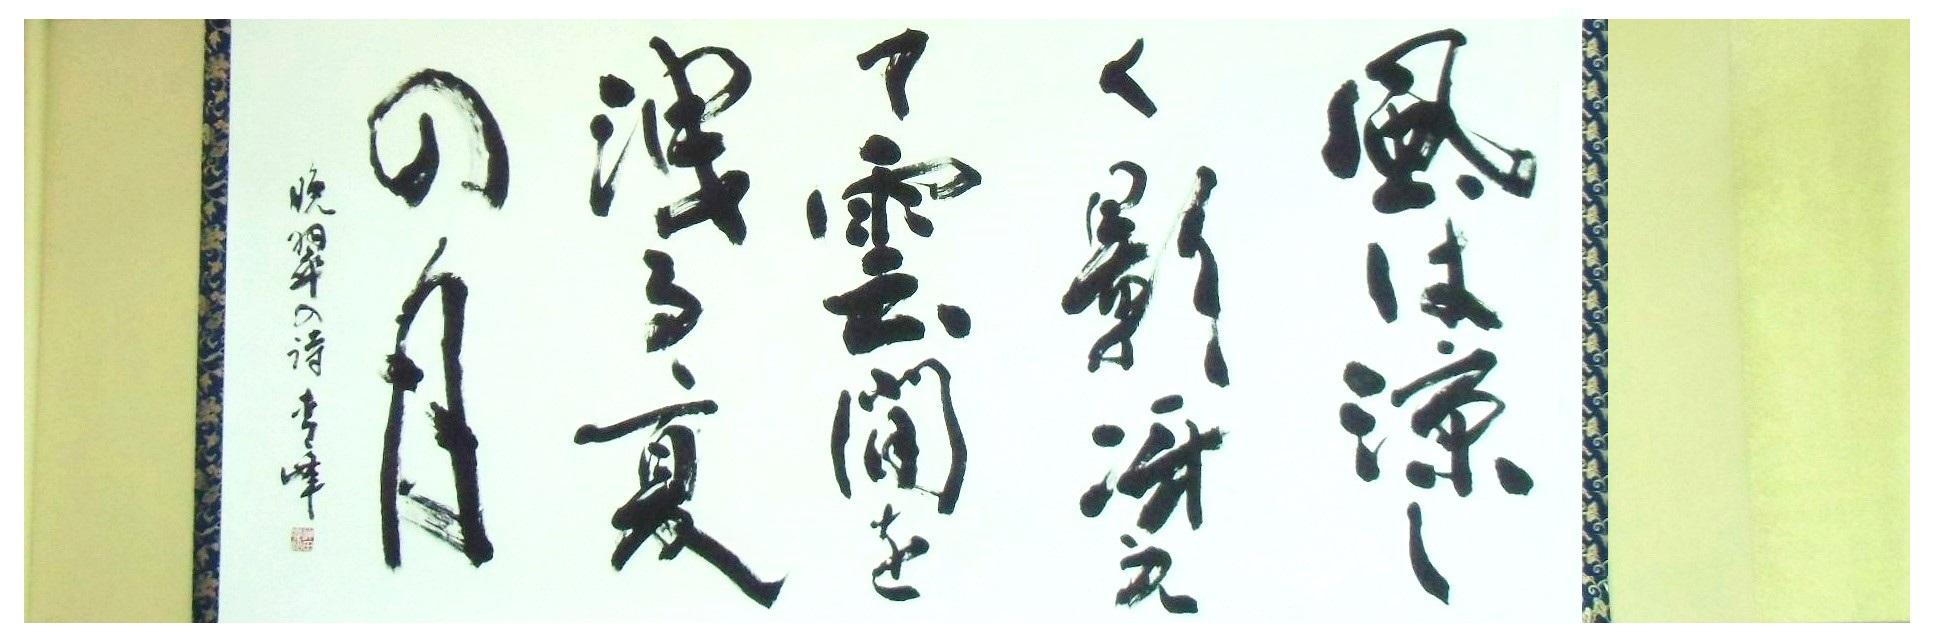 j-grand-prix-kakejiku-0001.jpg